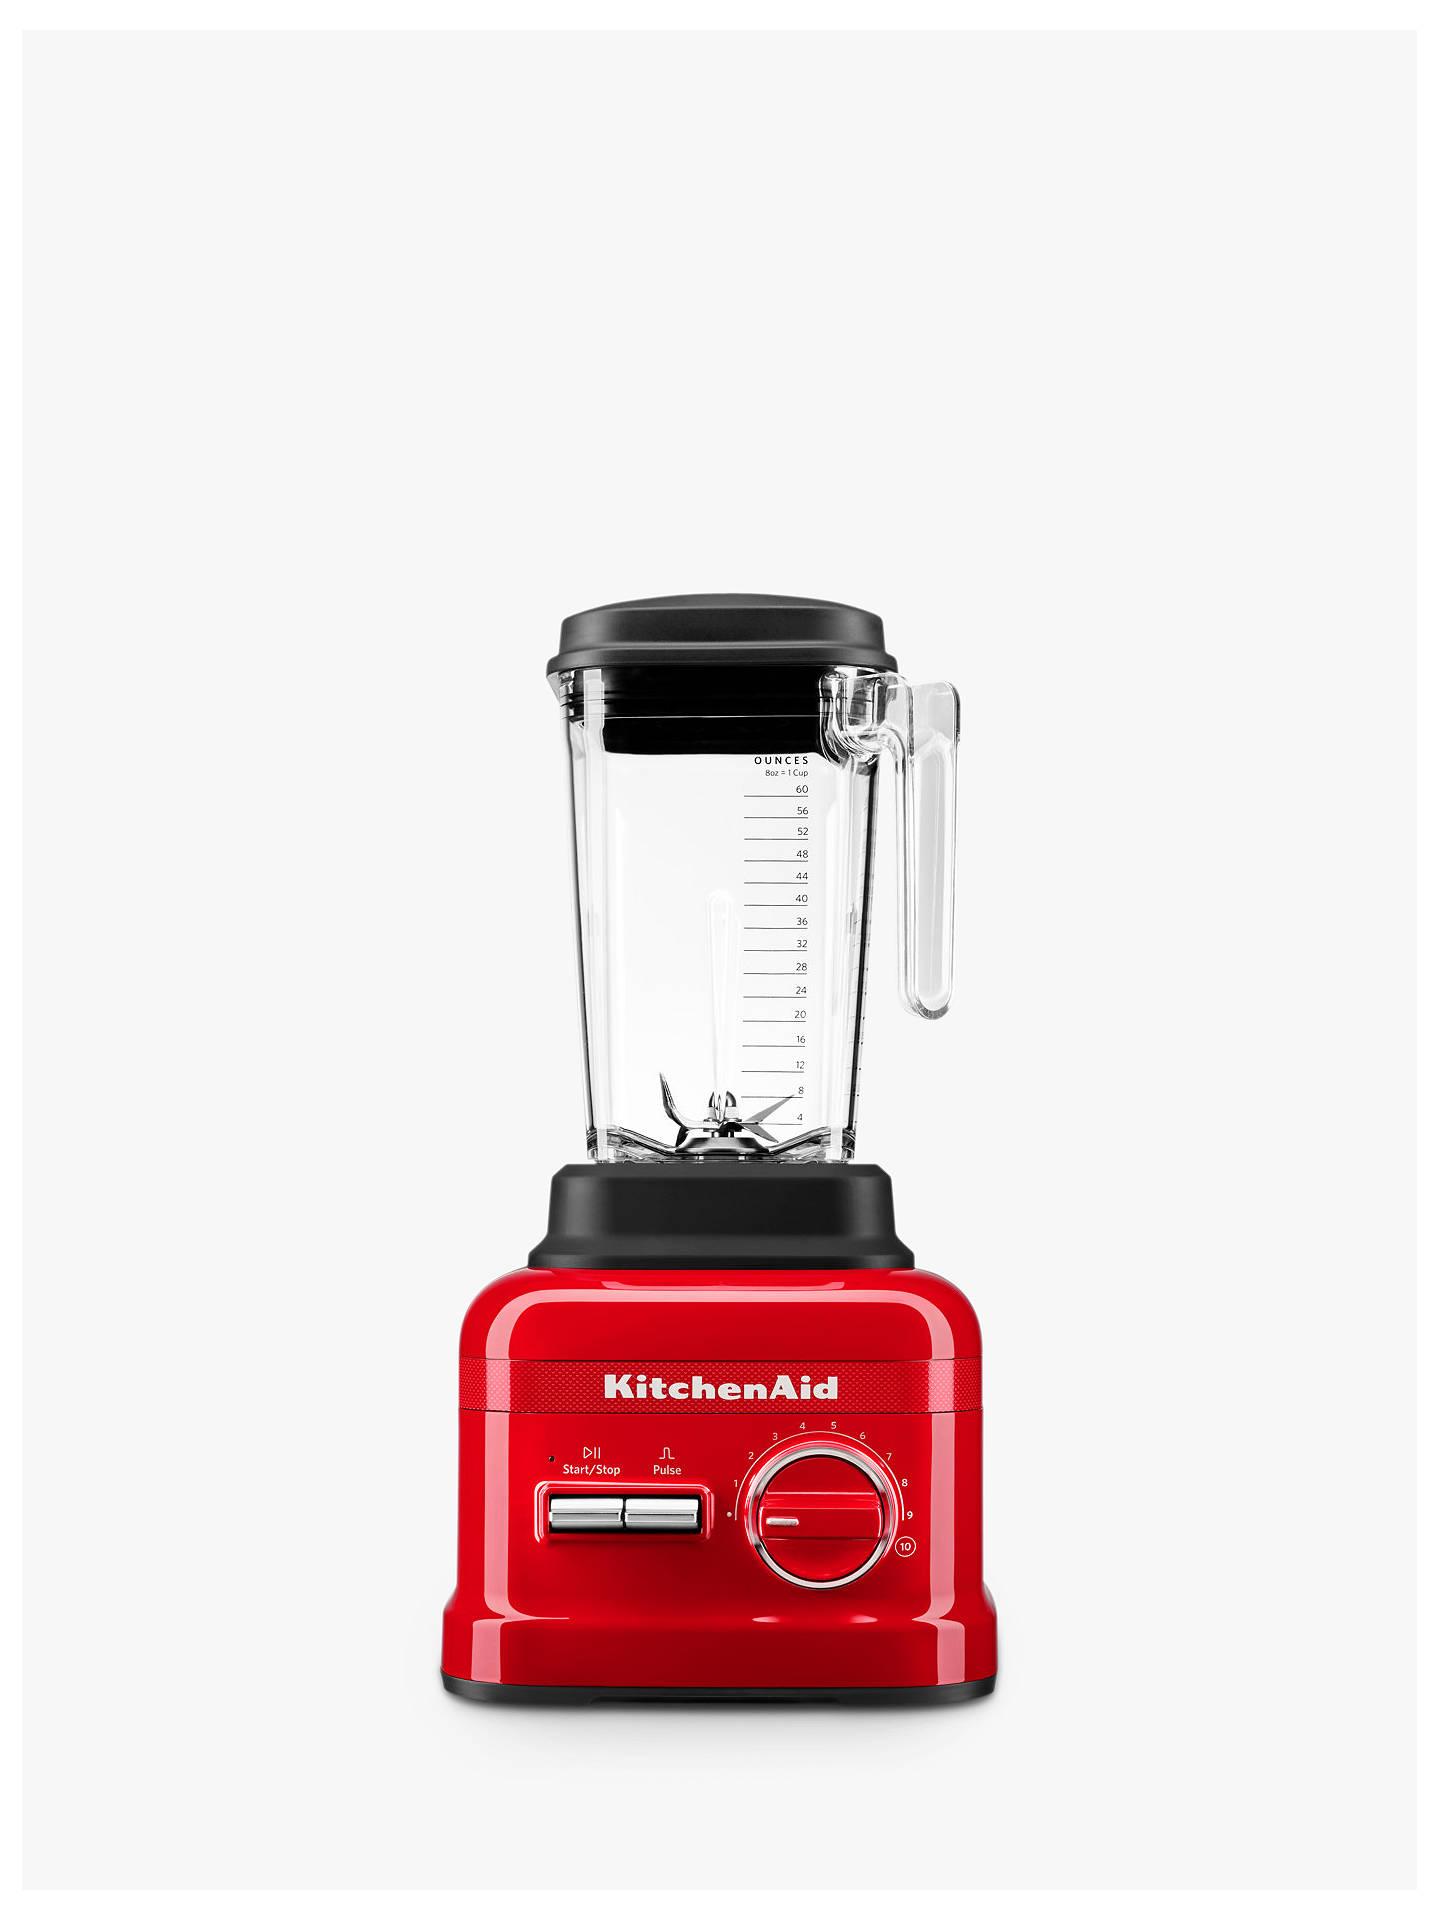 Kitchenaid Queen Of Hearts 5ksb6060hbsd Food Blender Red At John